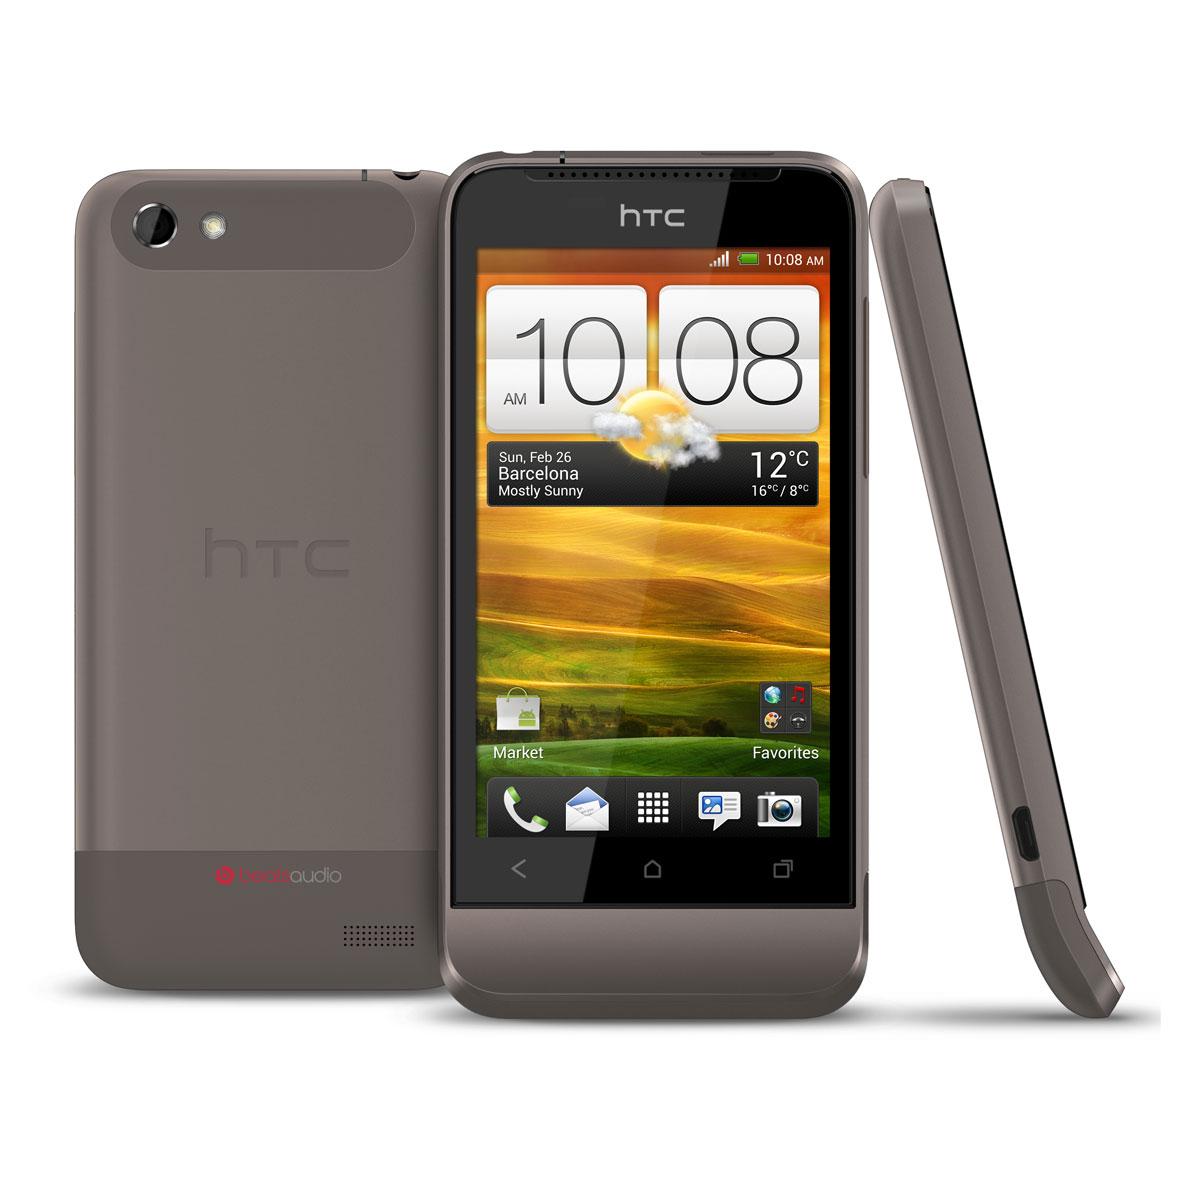 "Mobile & smartphone HTC One V Jupiter Rock Smartphone 3G+ avec écran tactile 3.7"" sous Android 4.0"